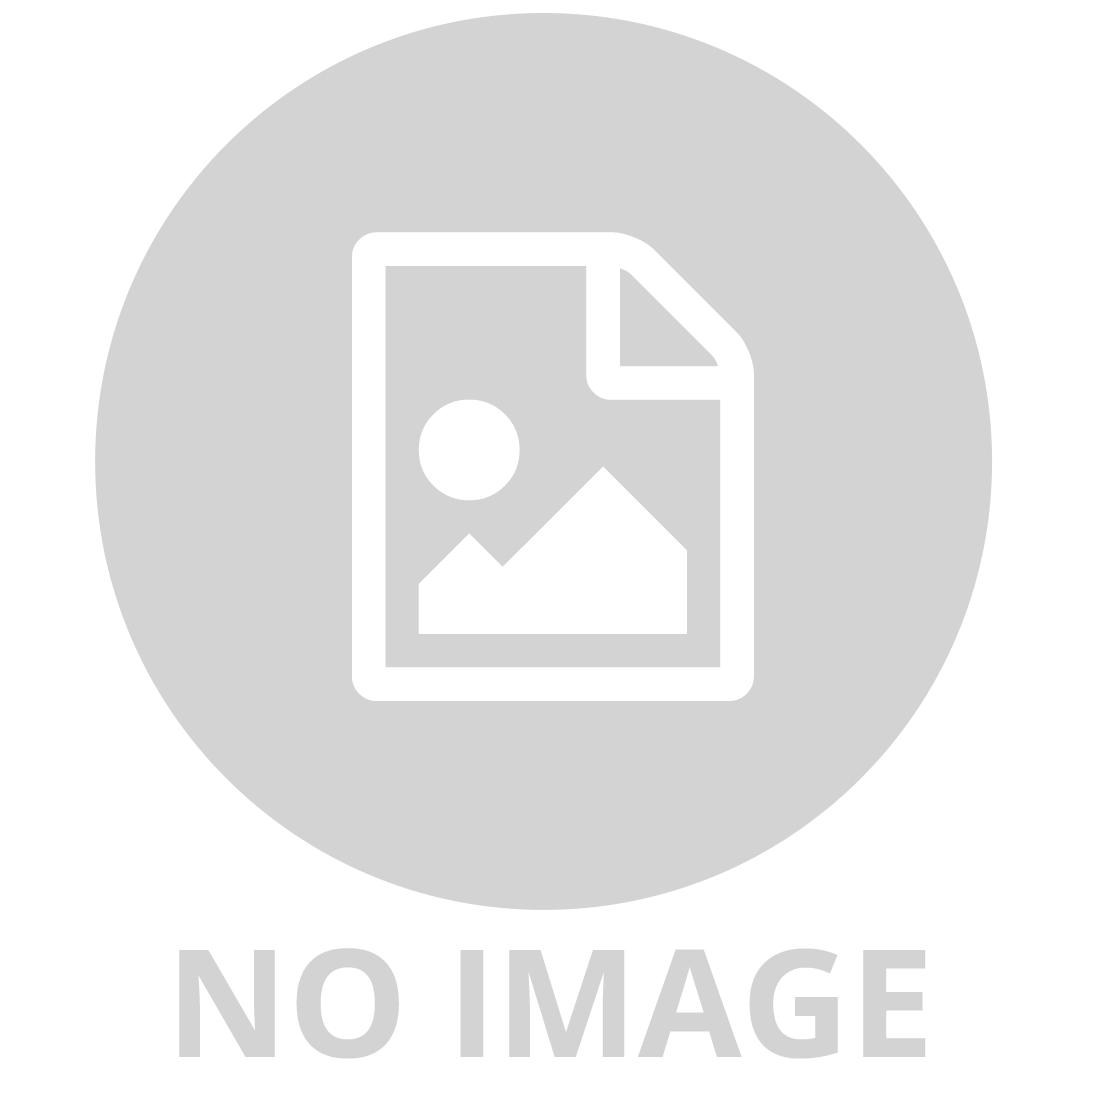 LEGO ELVES 41172 THE WATER DRAGON ADVENTURE